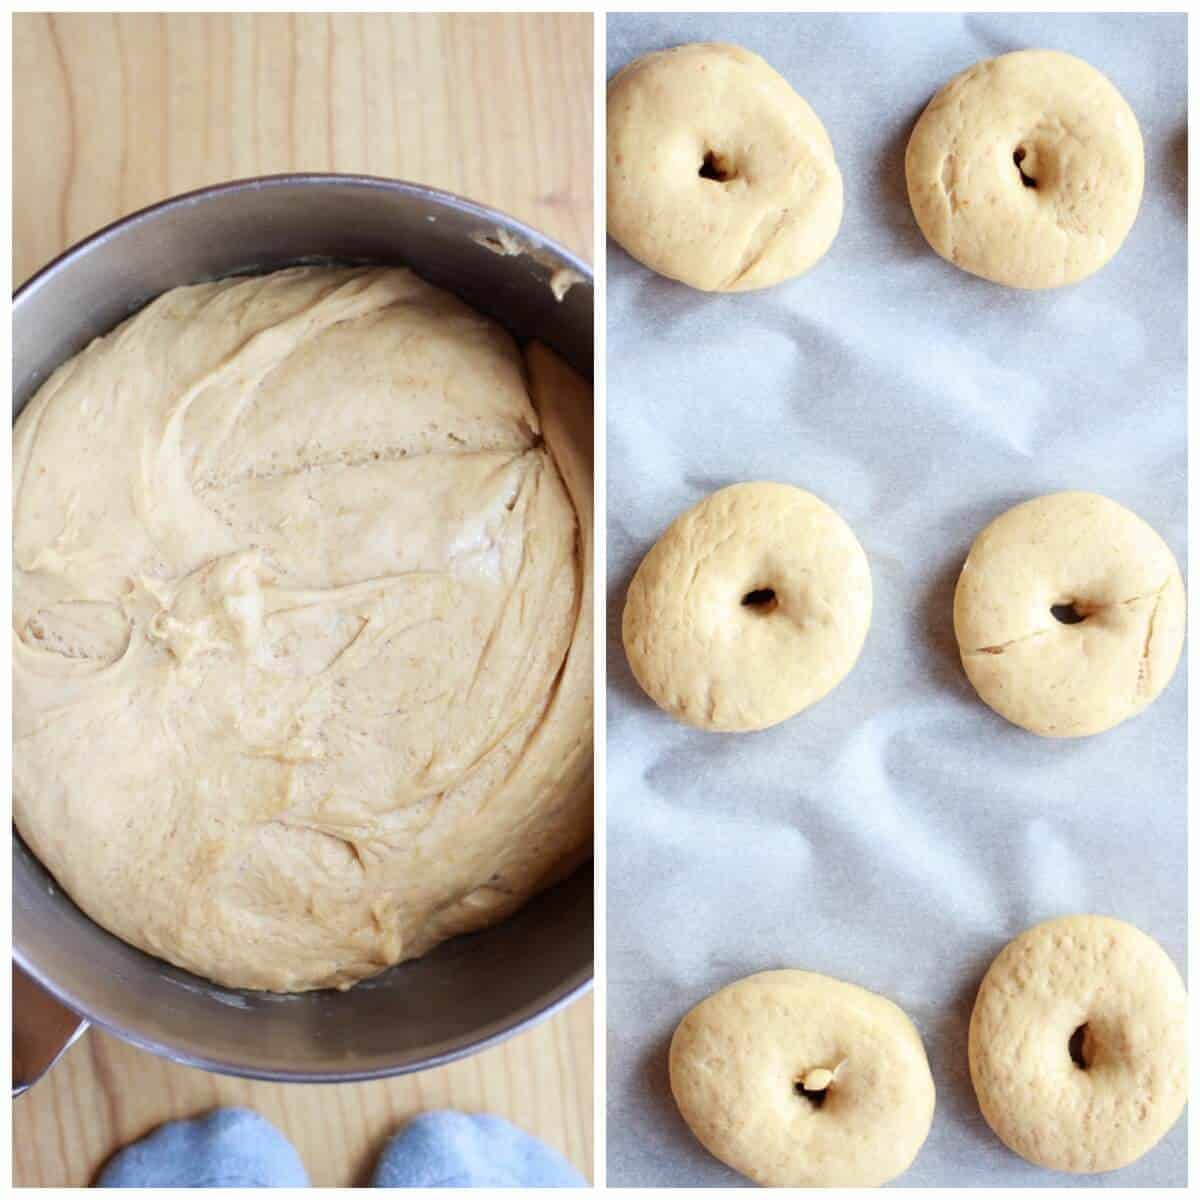 MIni Brown Sugar Glazed Graham Cracker Doughnuts | halfbakedharvest.com